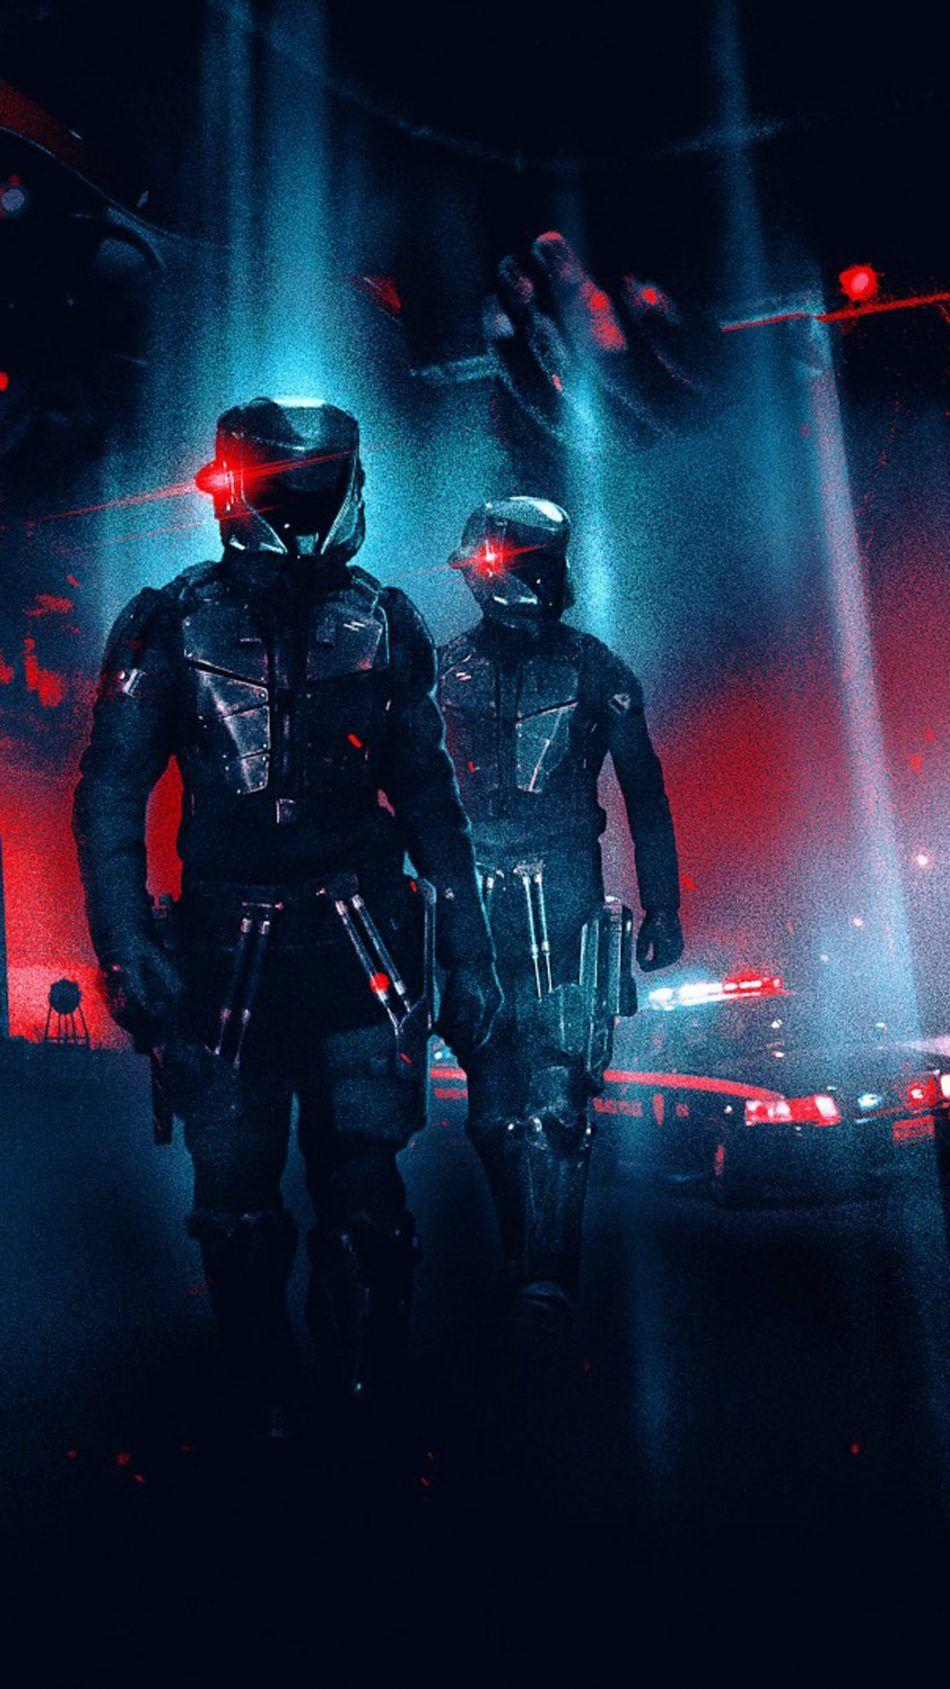 Kin Action Sci Fi 2018 4k Ultra Hd Mobile Wallpaper Science Fiction Artwork Mobile Wallpaper Sci Fi